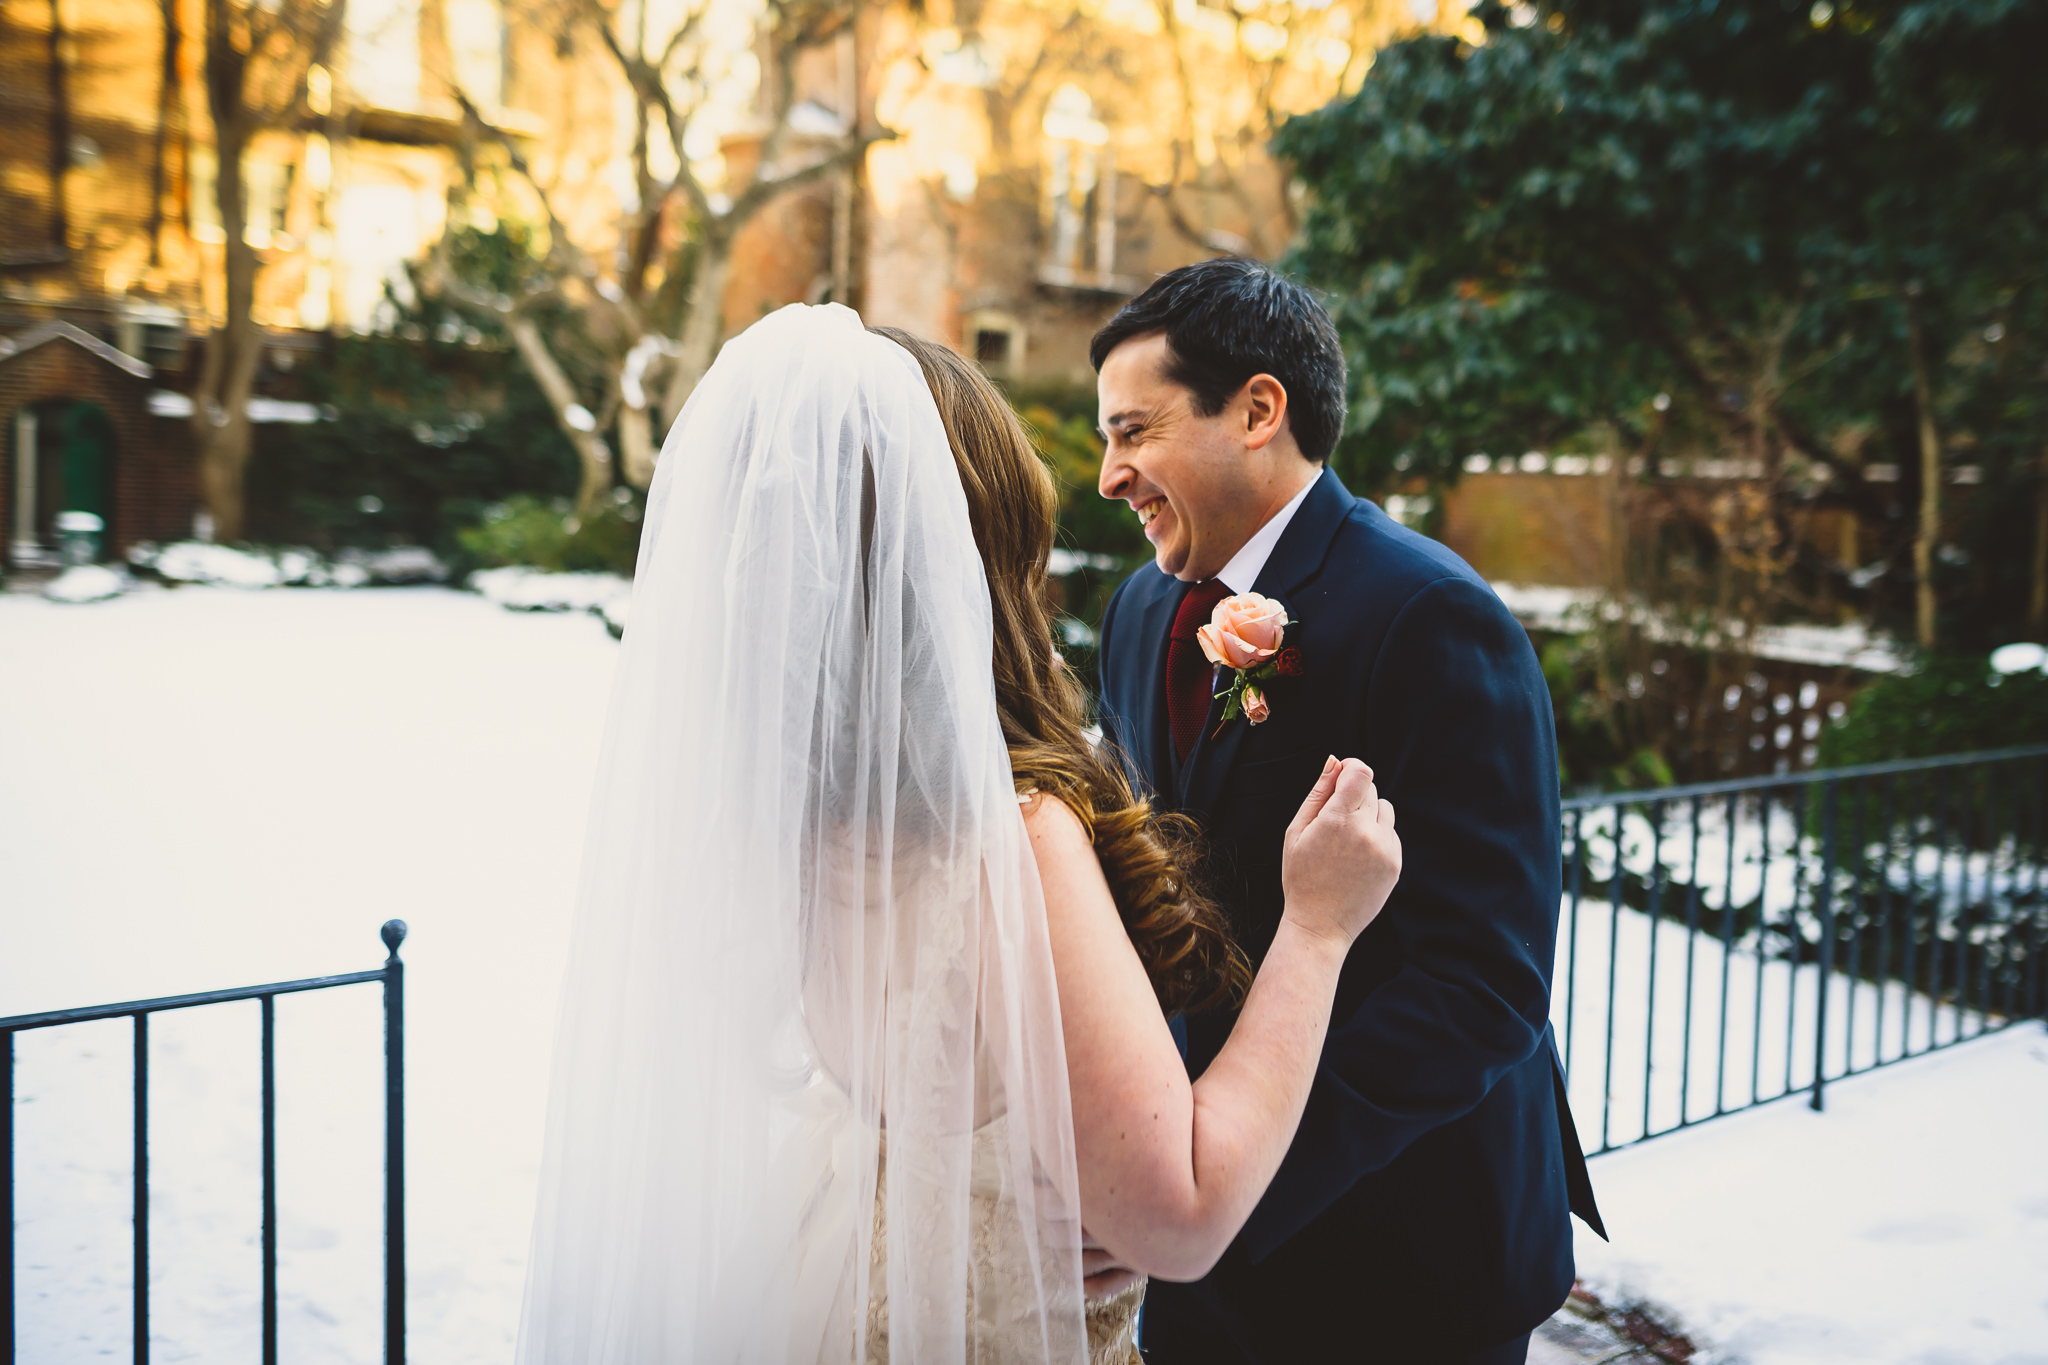 Colonial_Dames_Society_Wedding-0013.jpg